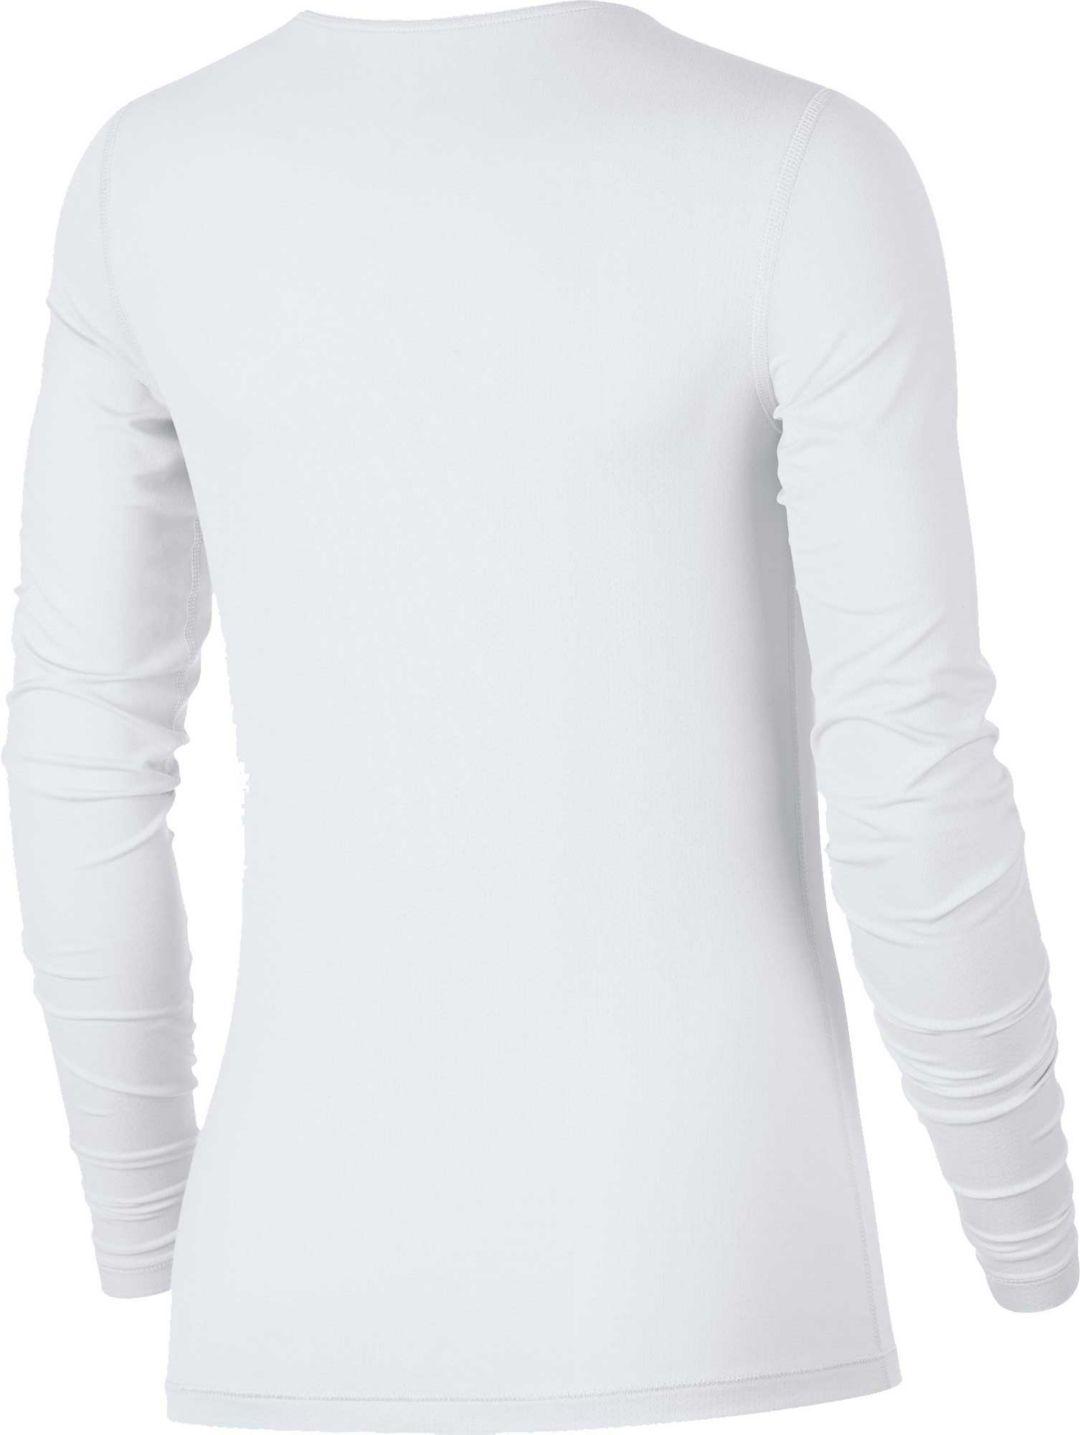 79dff1c2 Nike Women's Pro Cool Long Sleeve Training Shirt | DICK'S Sporting Goods